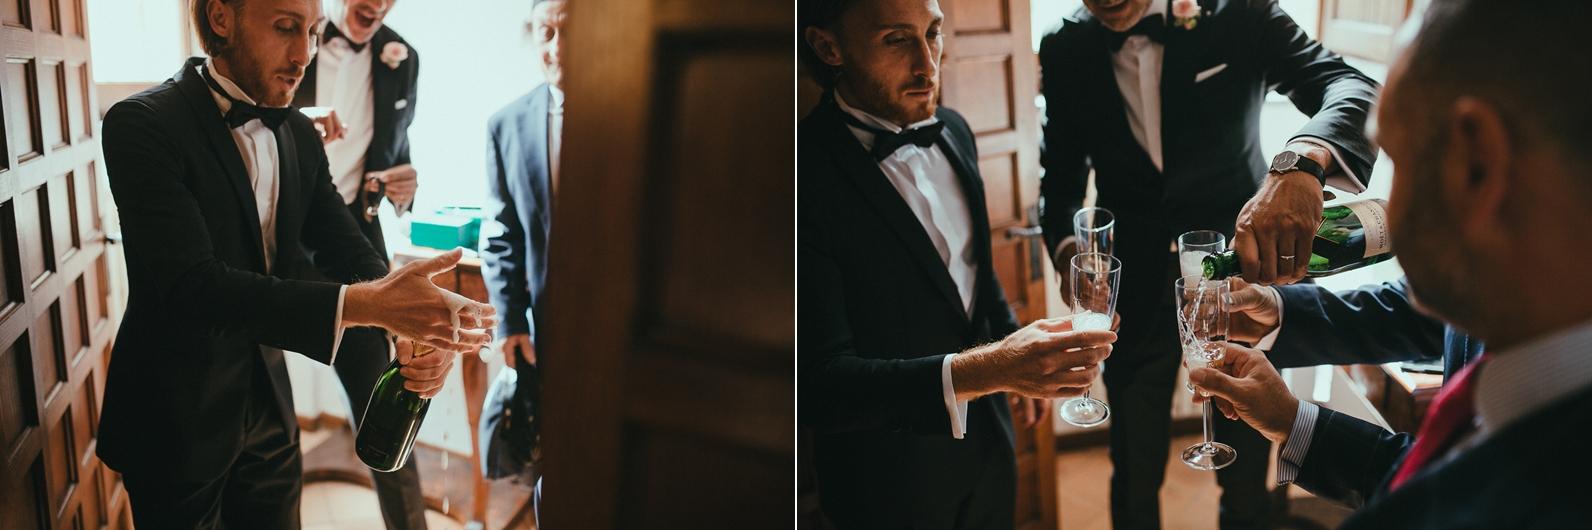 badia-orvieto-wedding-photographer (36).jpg